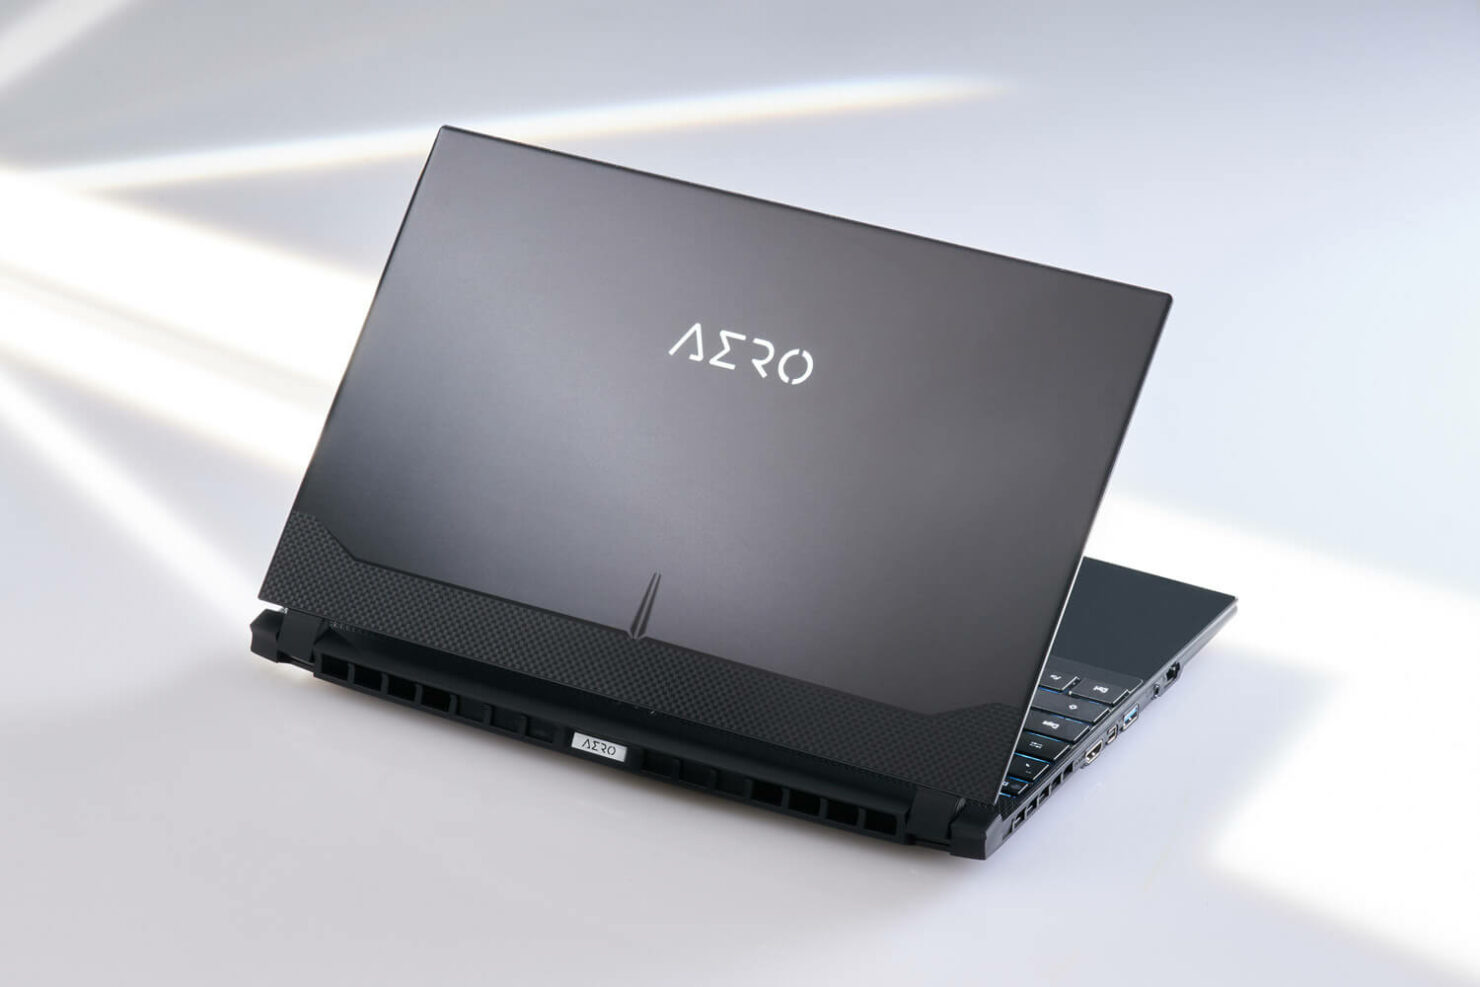 aero-intel-11th-gen-laptop-4